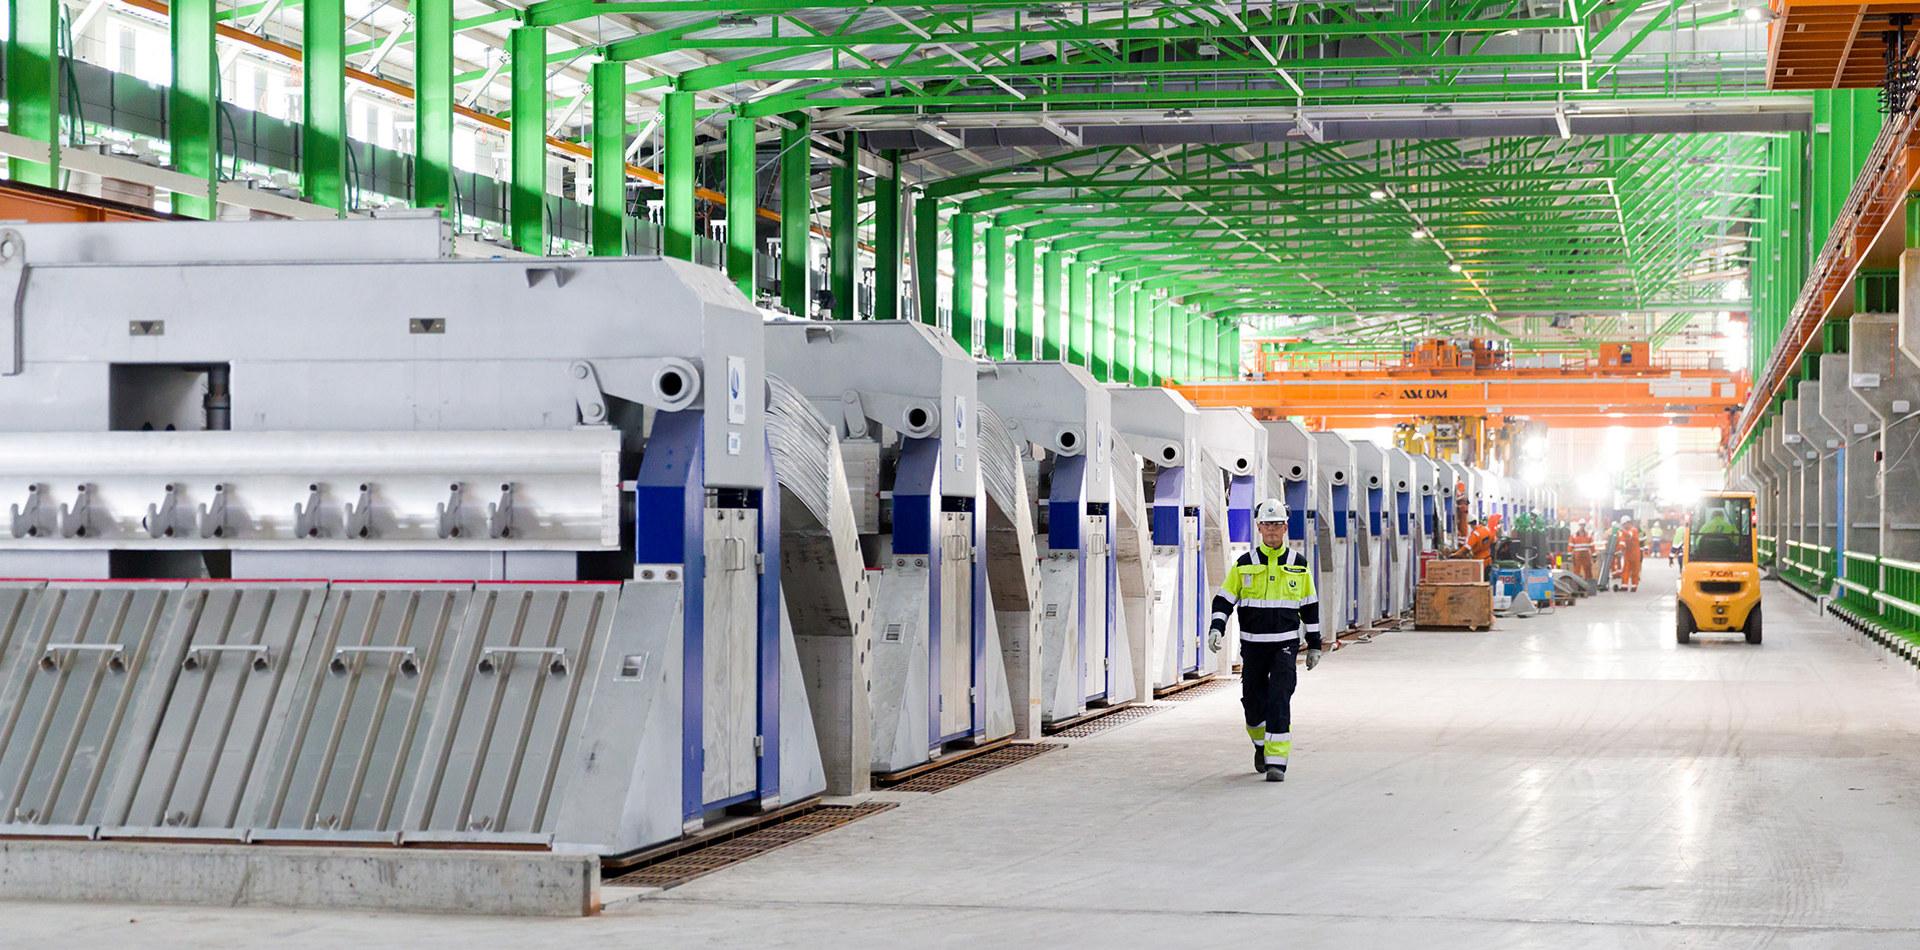 Elektrolysehallen på Hydros Karmøy-pilot. Foto: Øyvind Breivik / Hydro